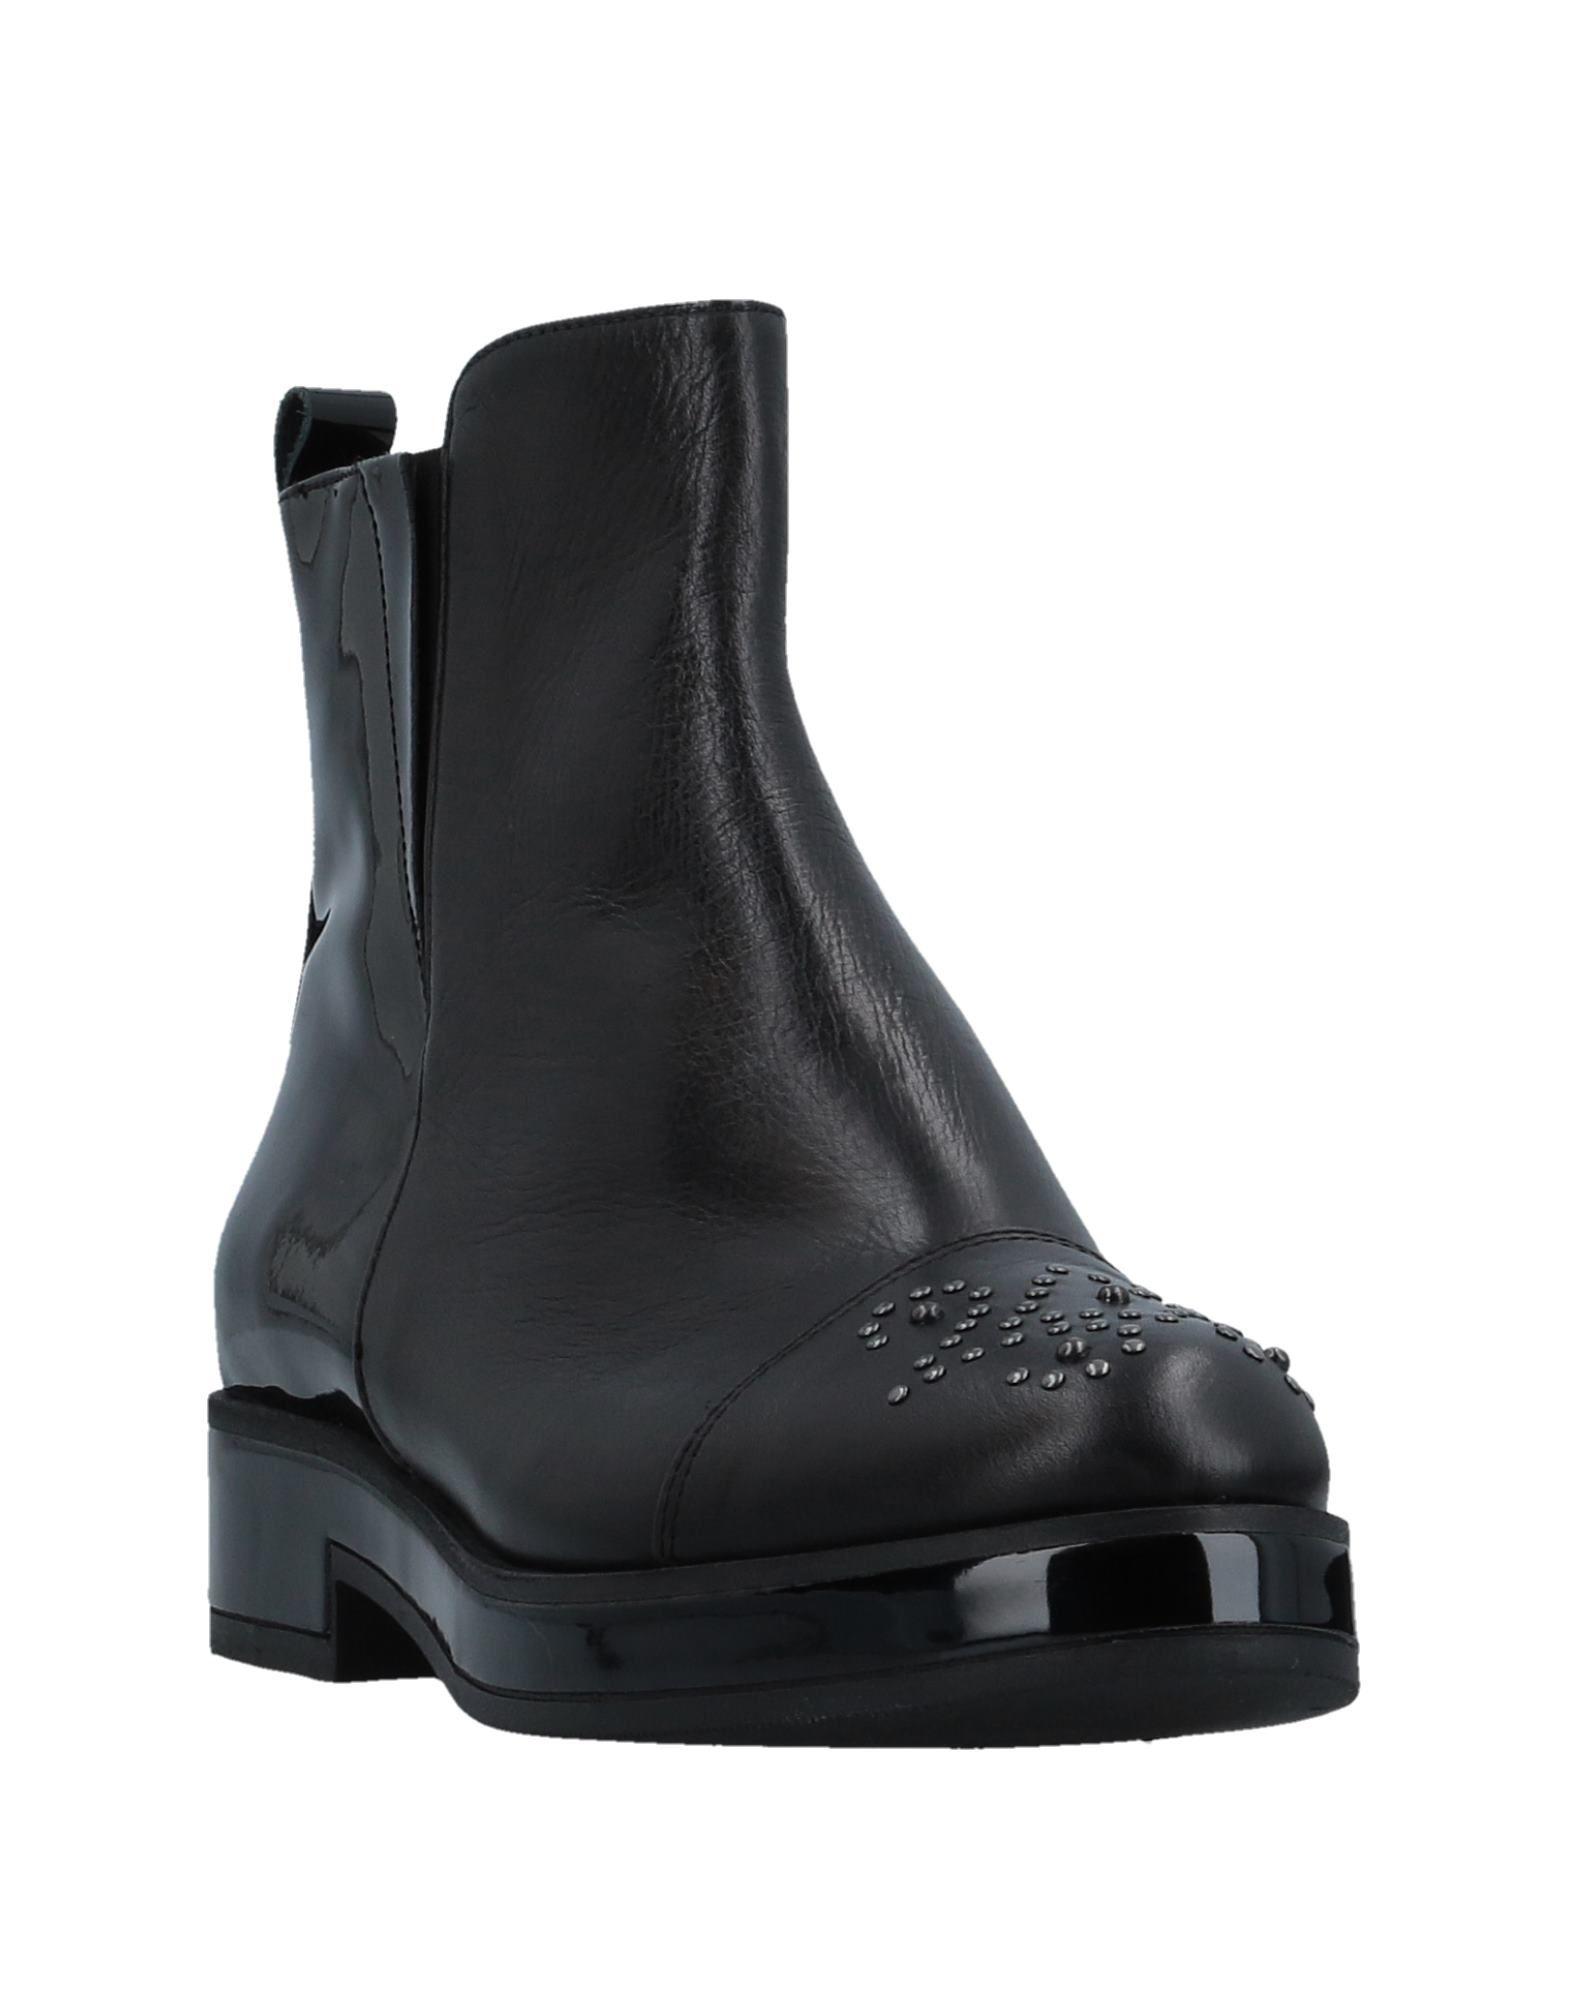 Stilvolle billige Schuhe Damen Carlo Pazolini Chelsea Boots Damen Schuhe  11509948KD 9df966